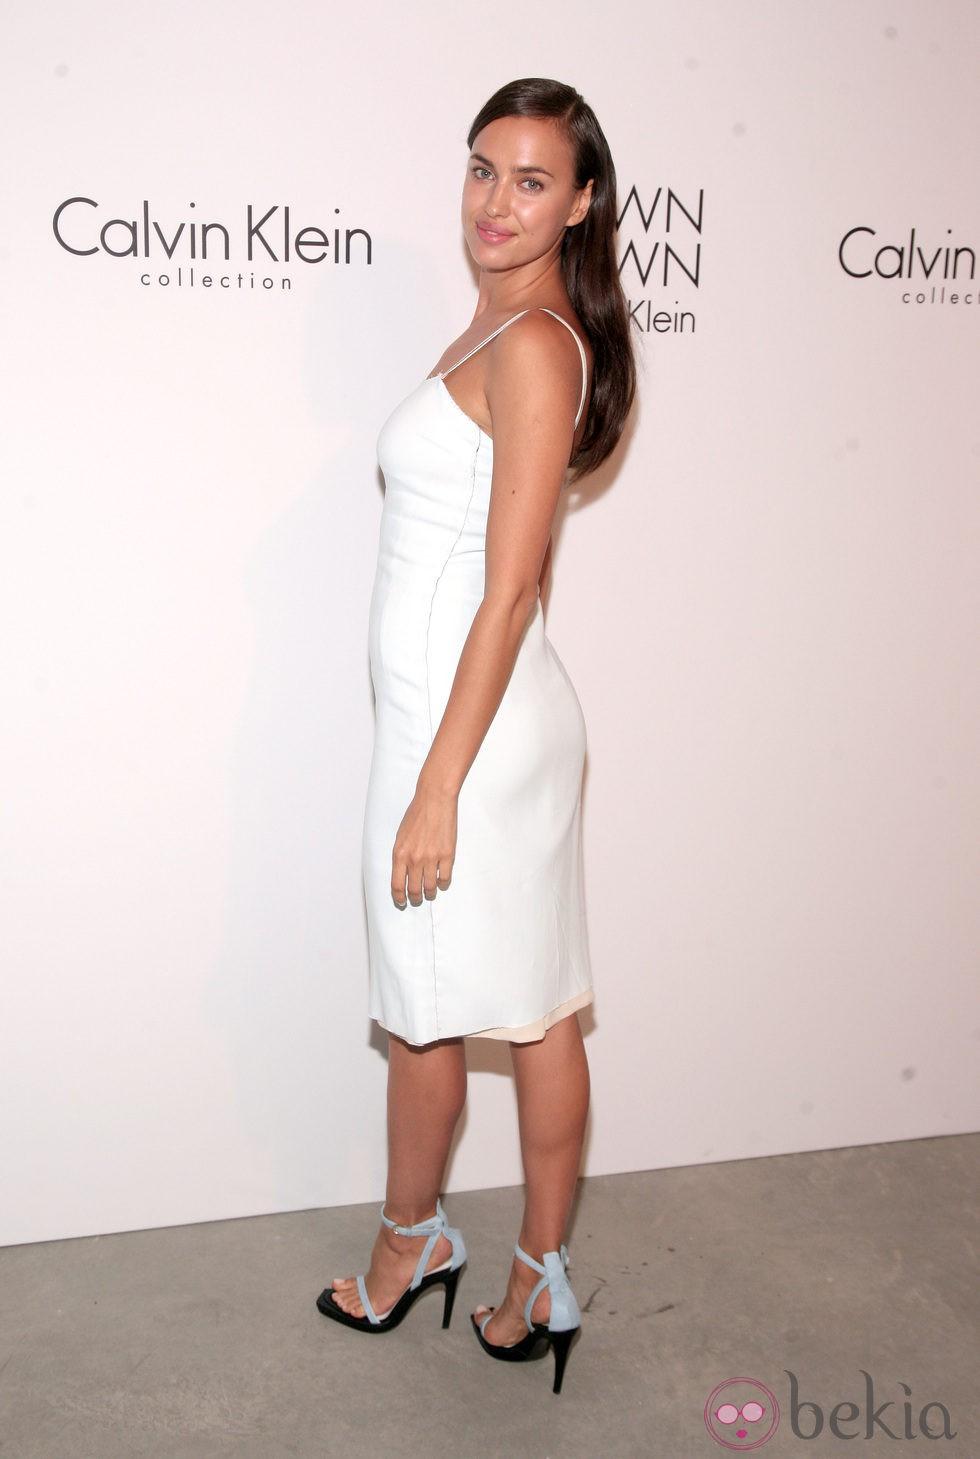 Irina Shayk en la fiesta Calvin Klein tras su desfile primavera/verano 2014 de la Semana de la Moda de Nueva York